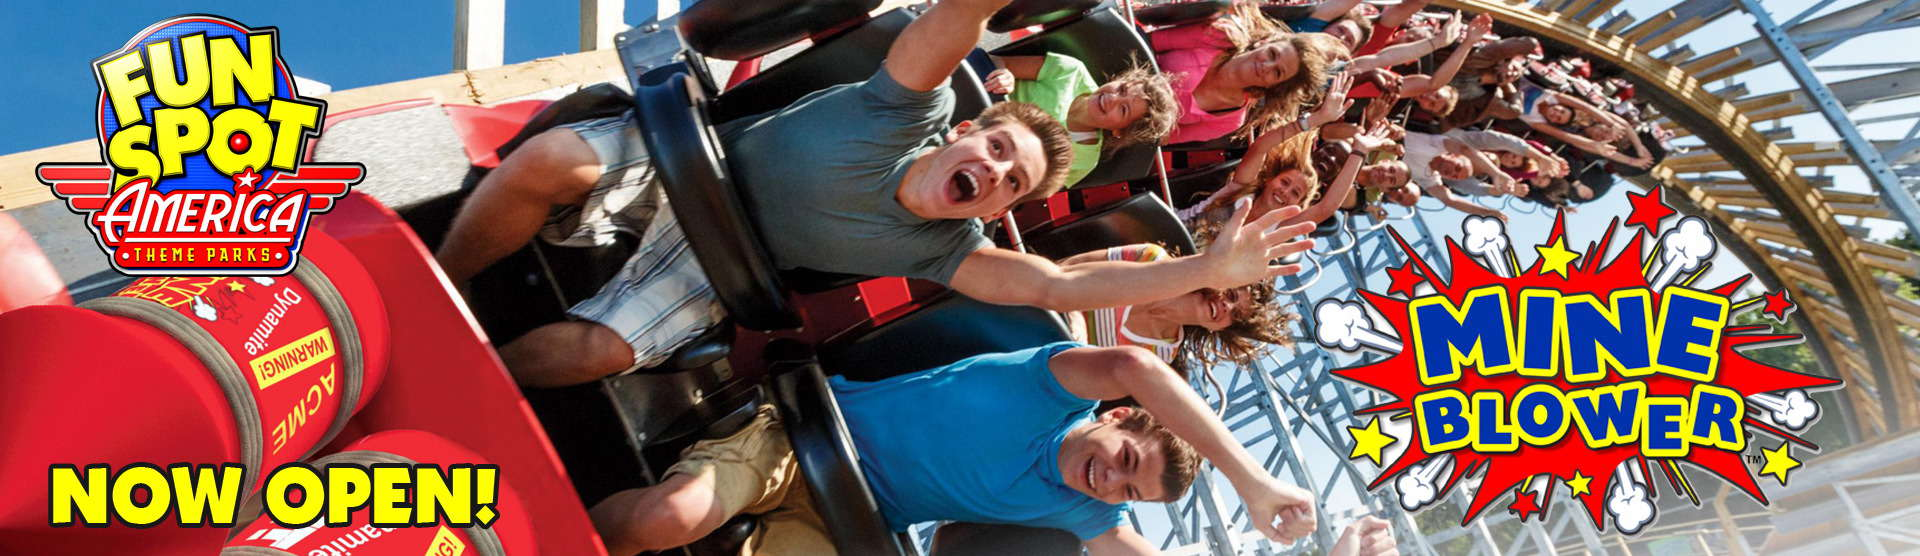 KGS Discount Attraction Tickets Orlando Fun Spot HS